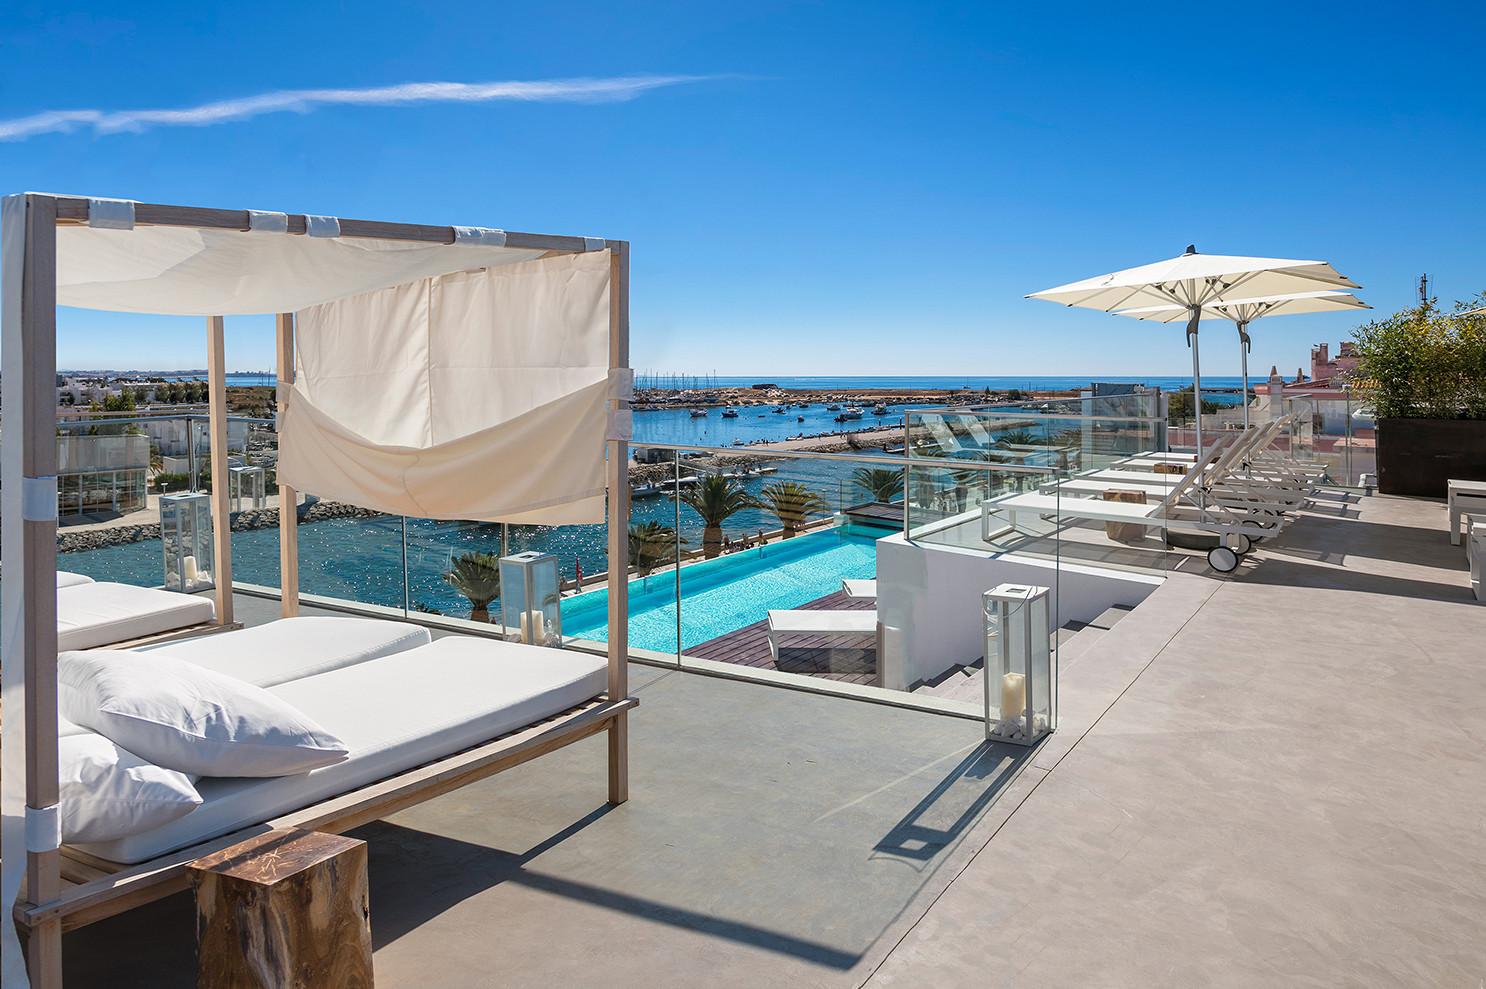 Lagos Avenida Hotel - Algarve infinitypool_low quality.jpg